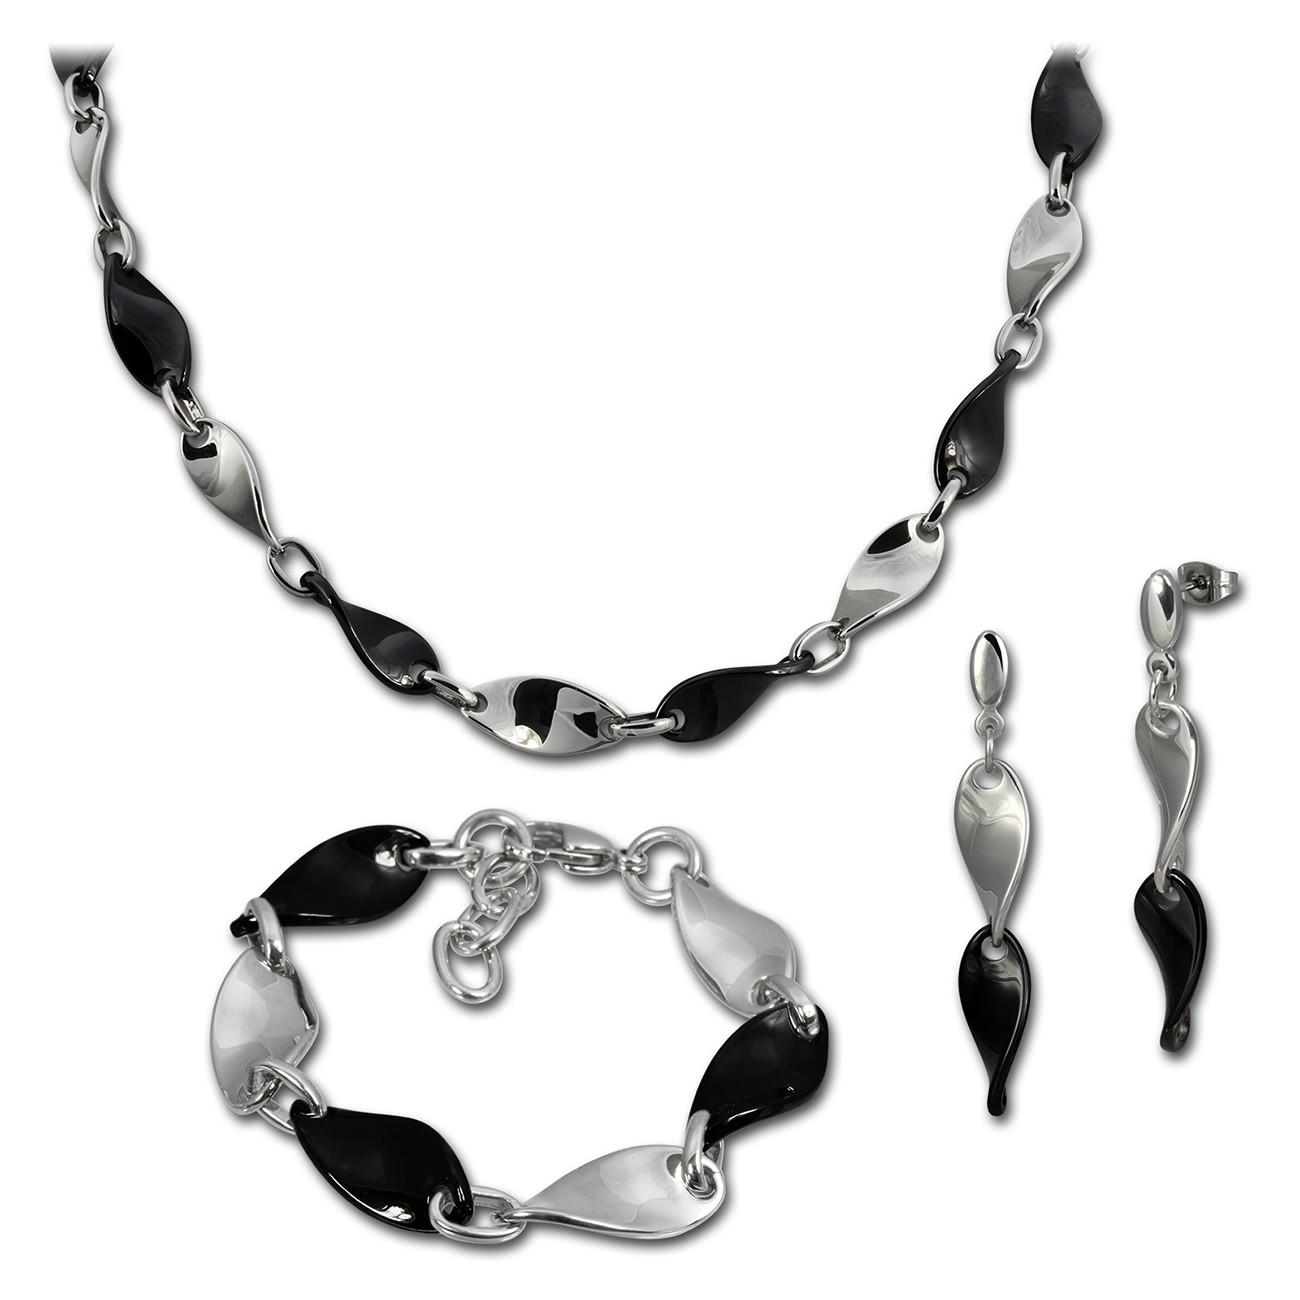 Amello Edelstahlset Keramik Welle Kette, Armband, Ohrring ESSX08S